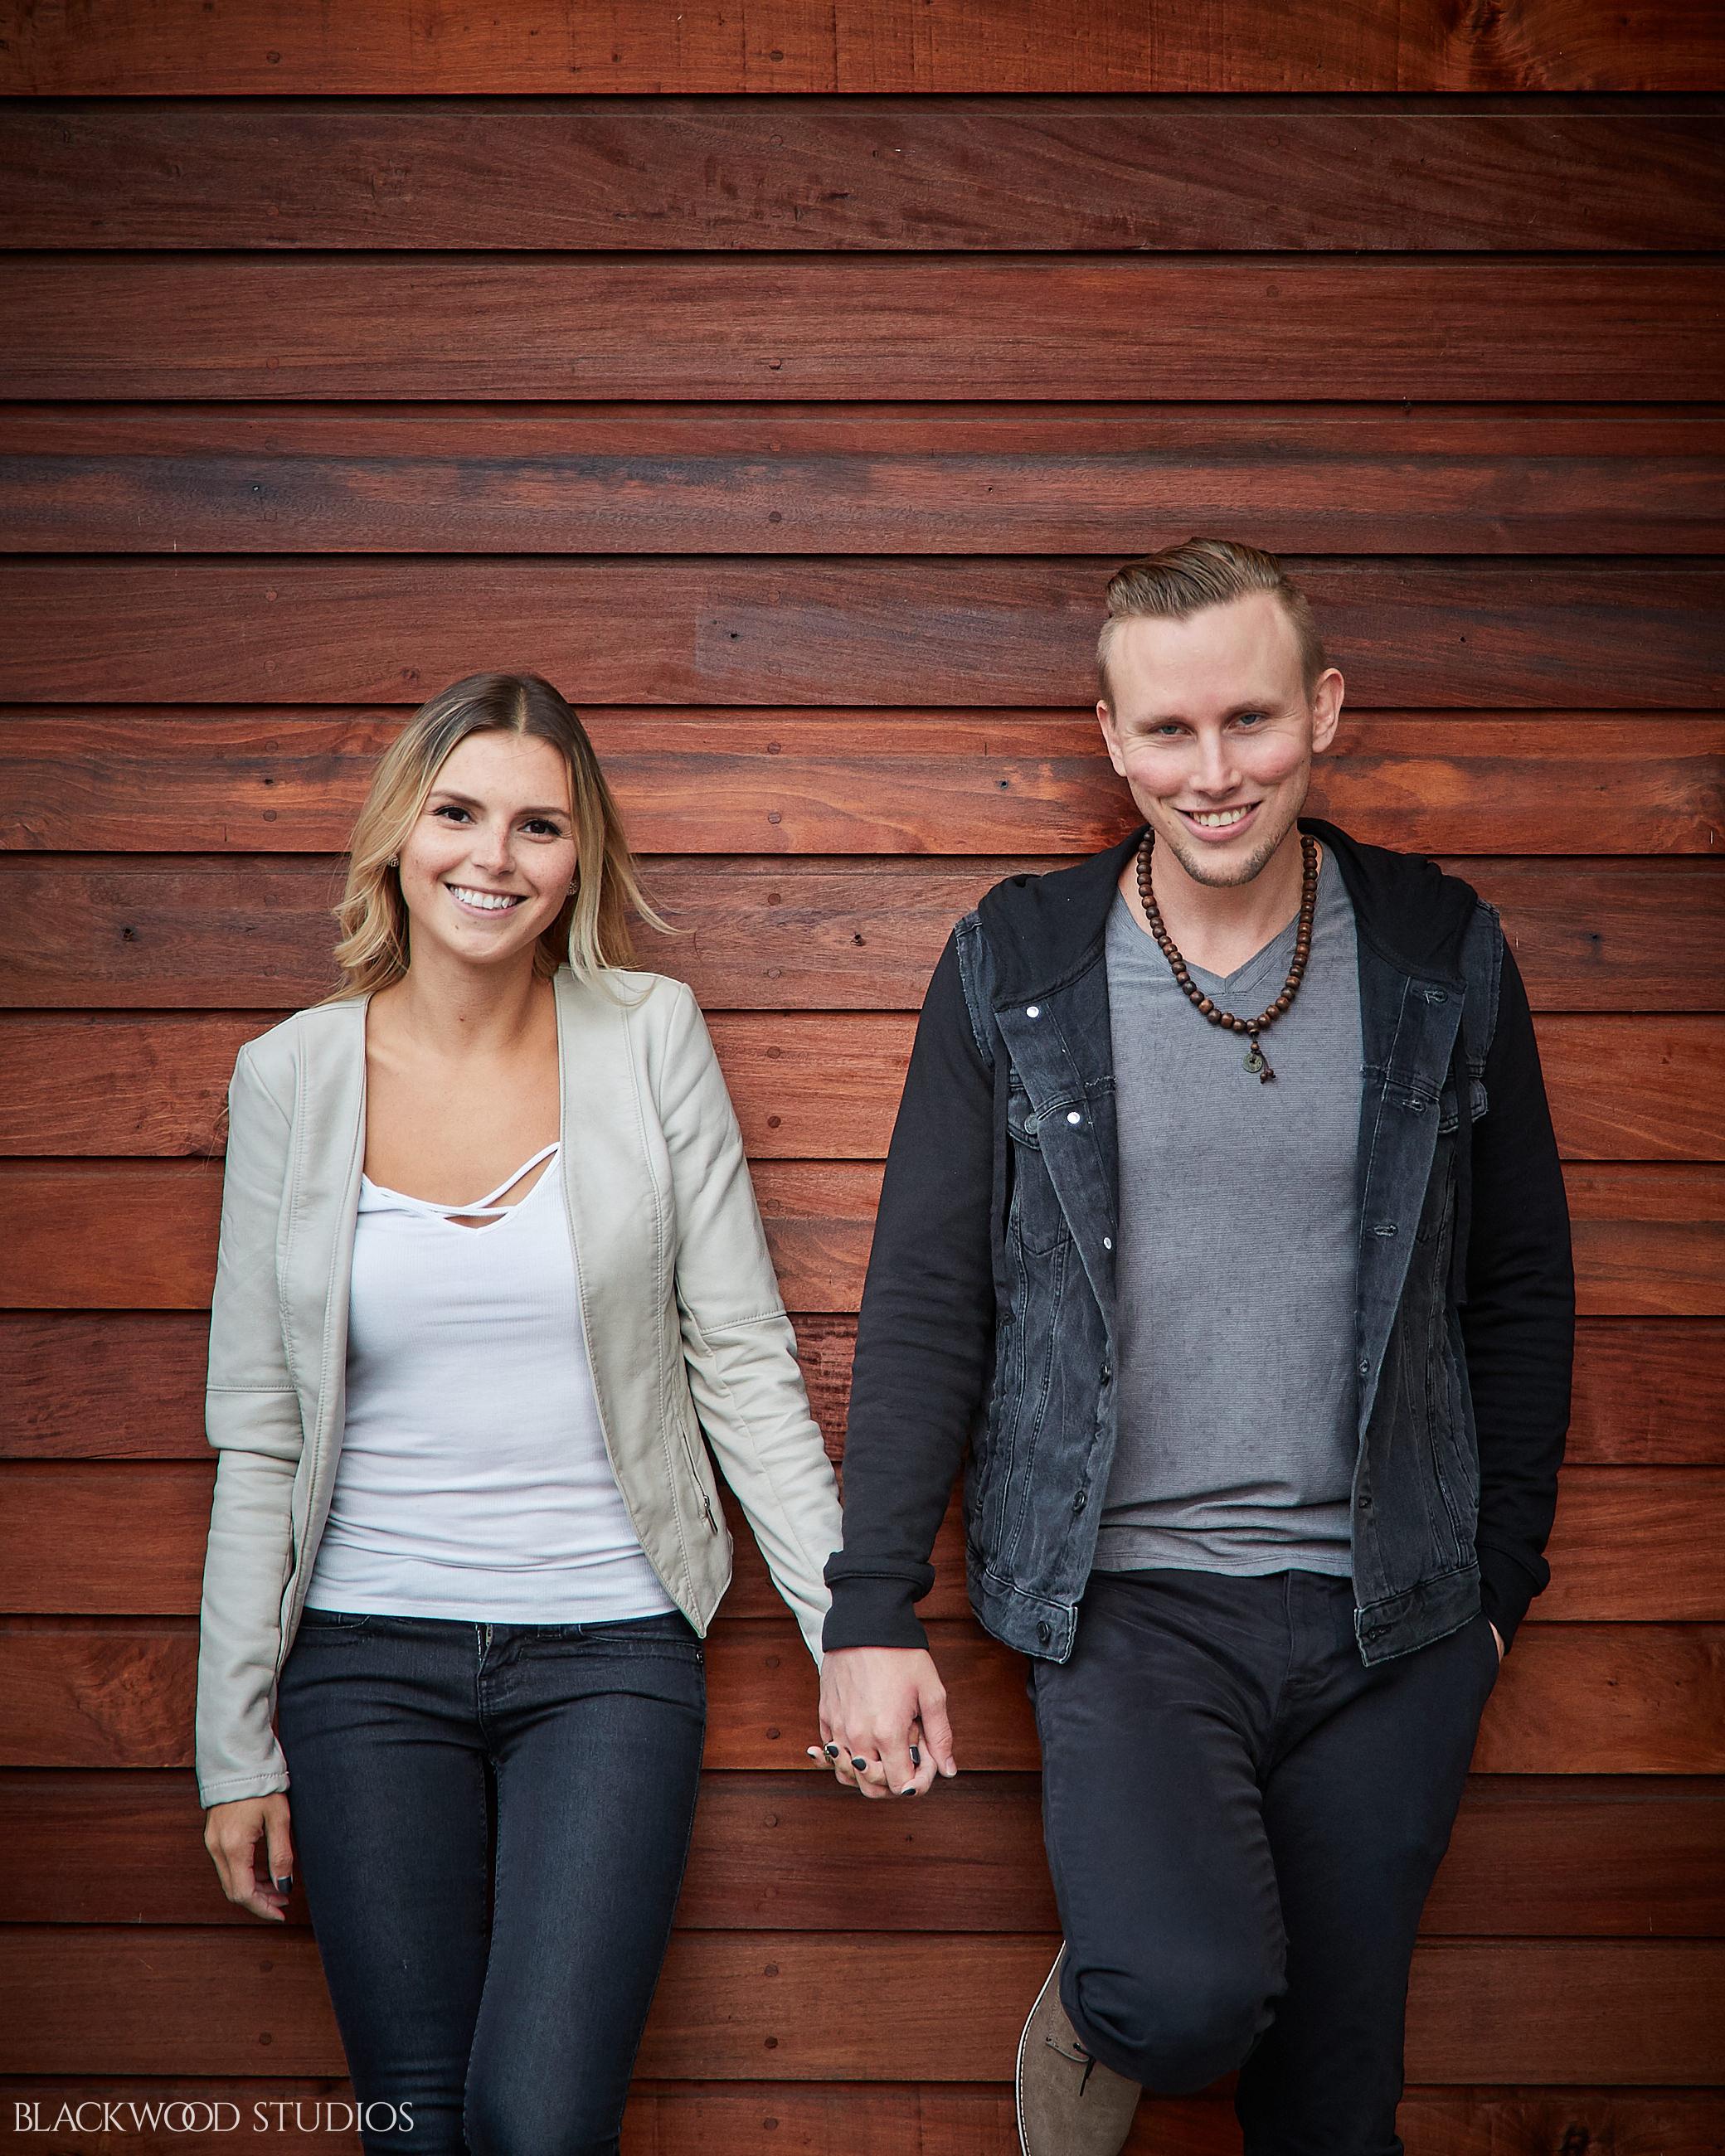 Blackwood-Studios-20181012-180948-Aleisha-and-Brad-Engagement-photography-Toronto-Ontario-Canada-Corktown-Common.jpg